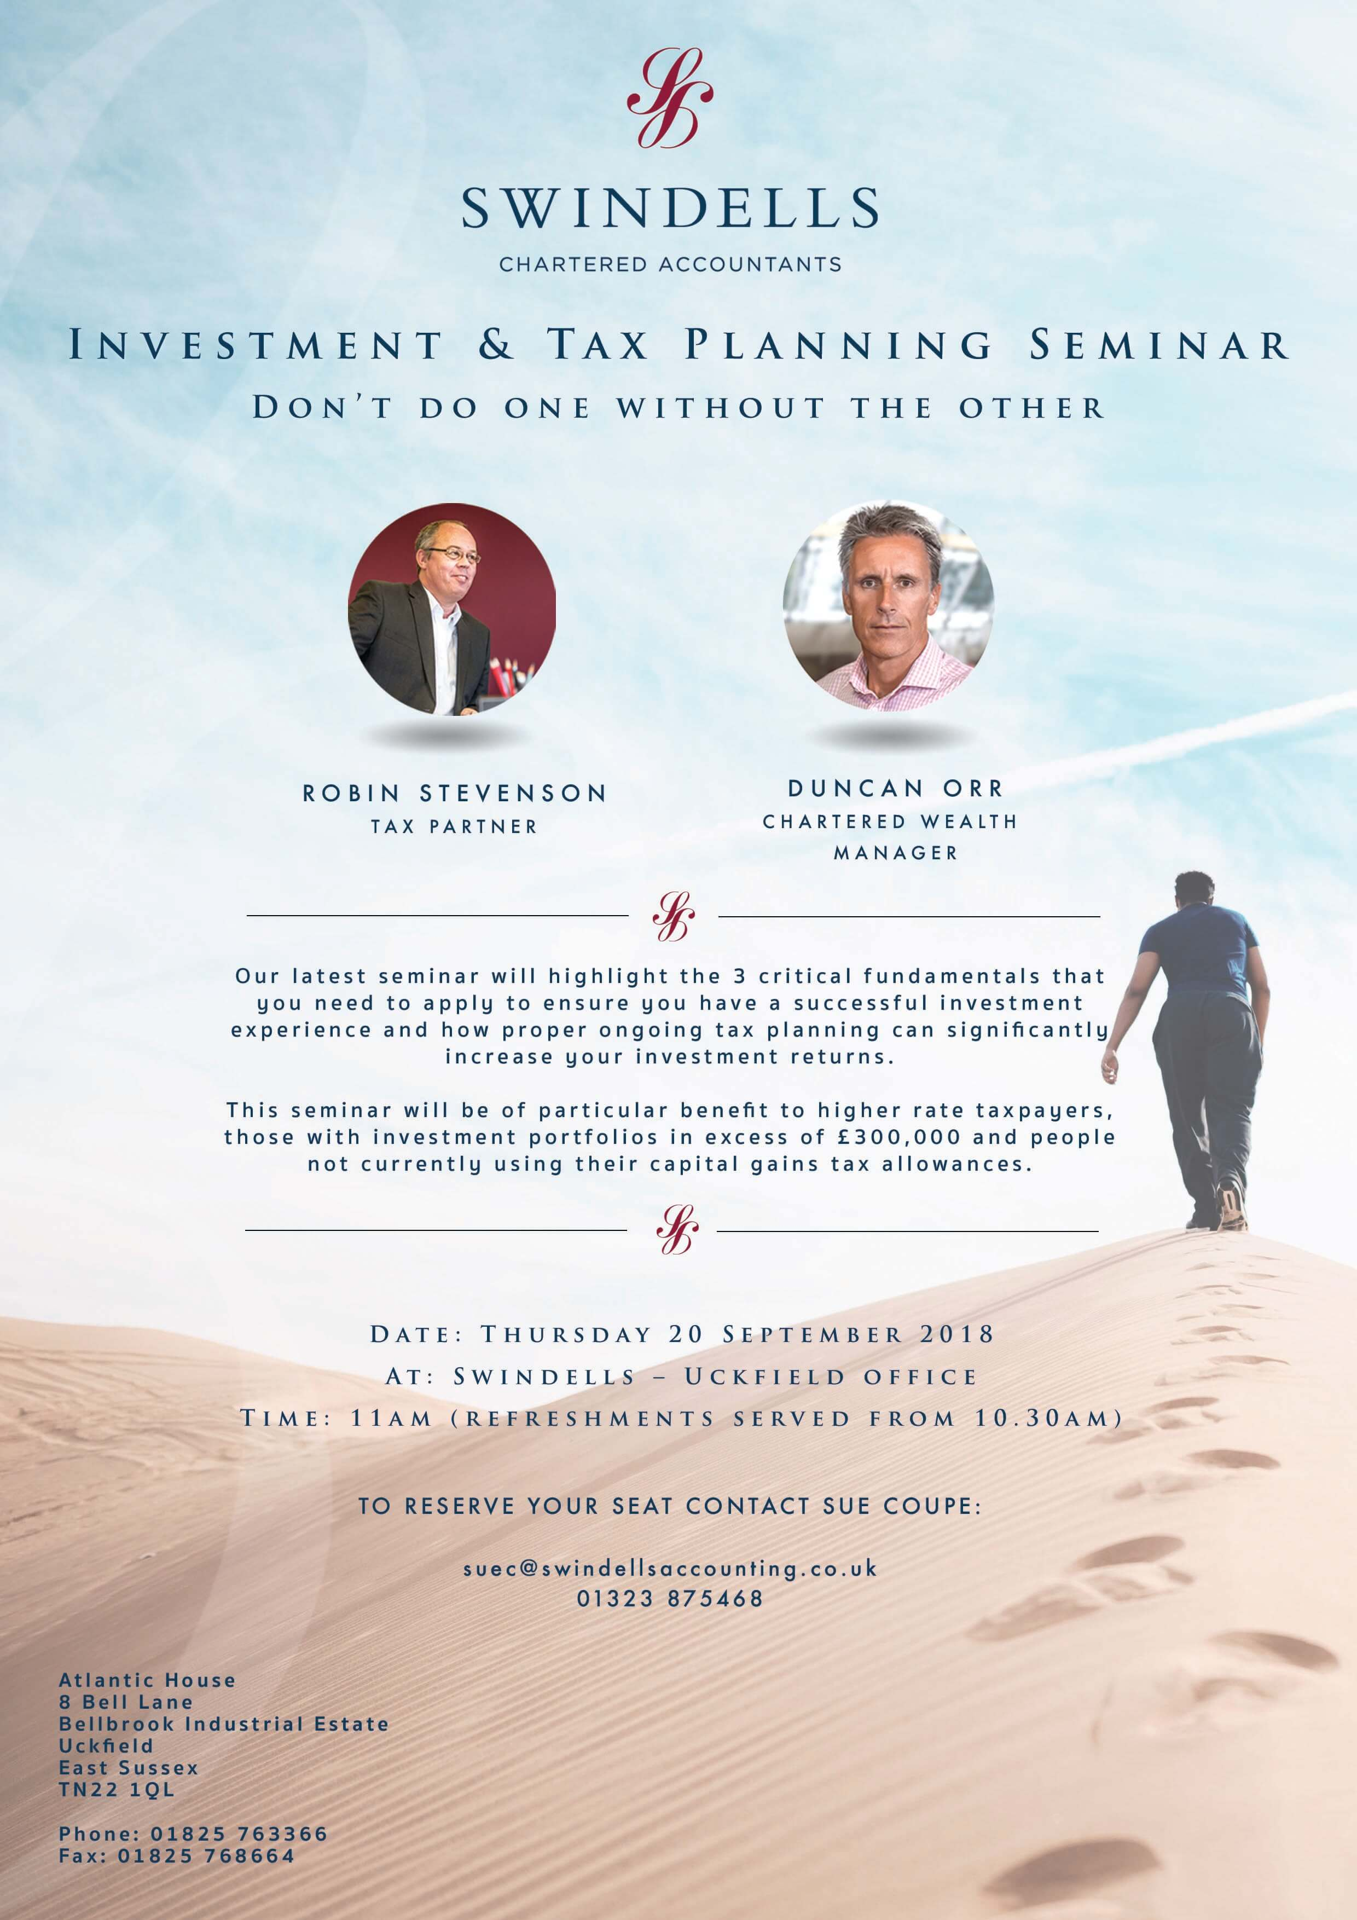 Swindells Investment seminar